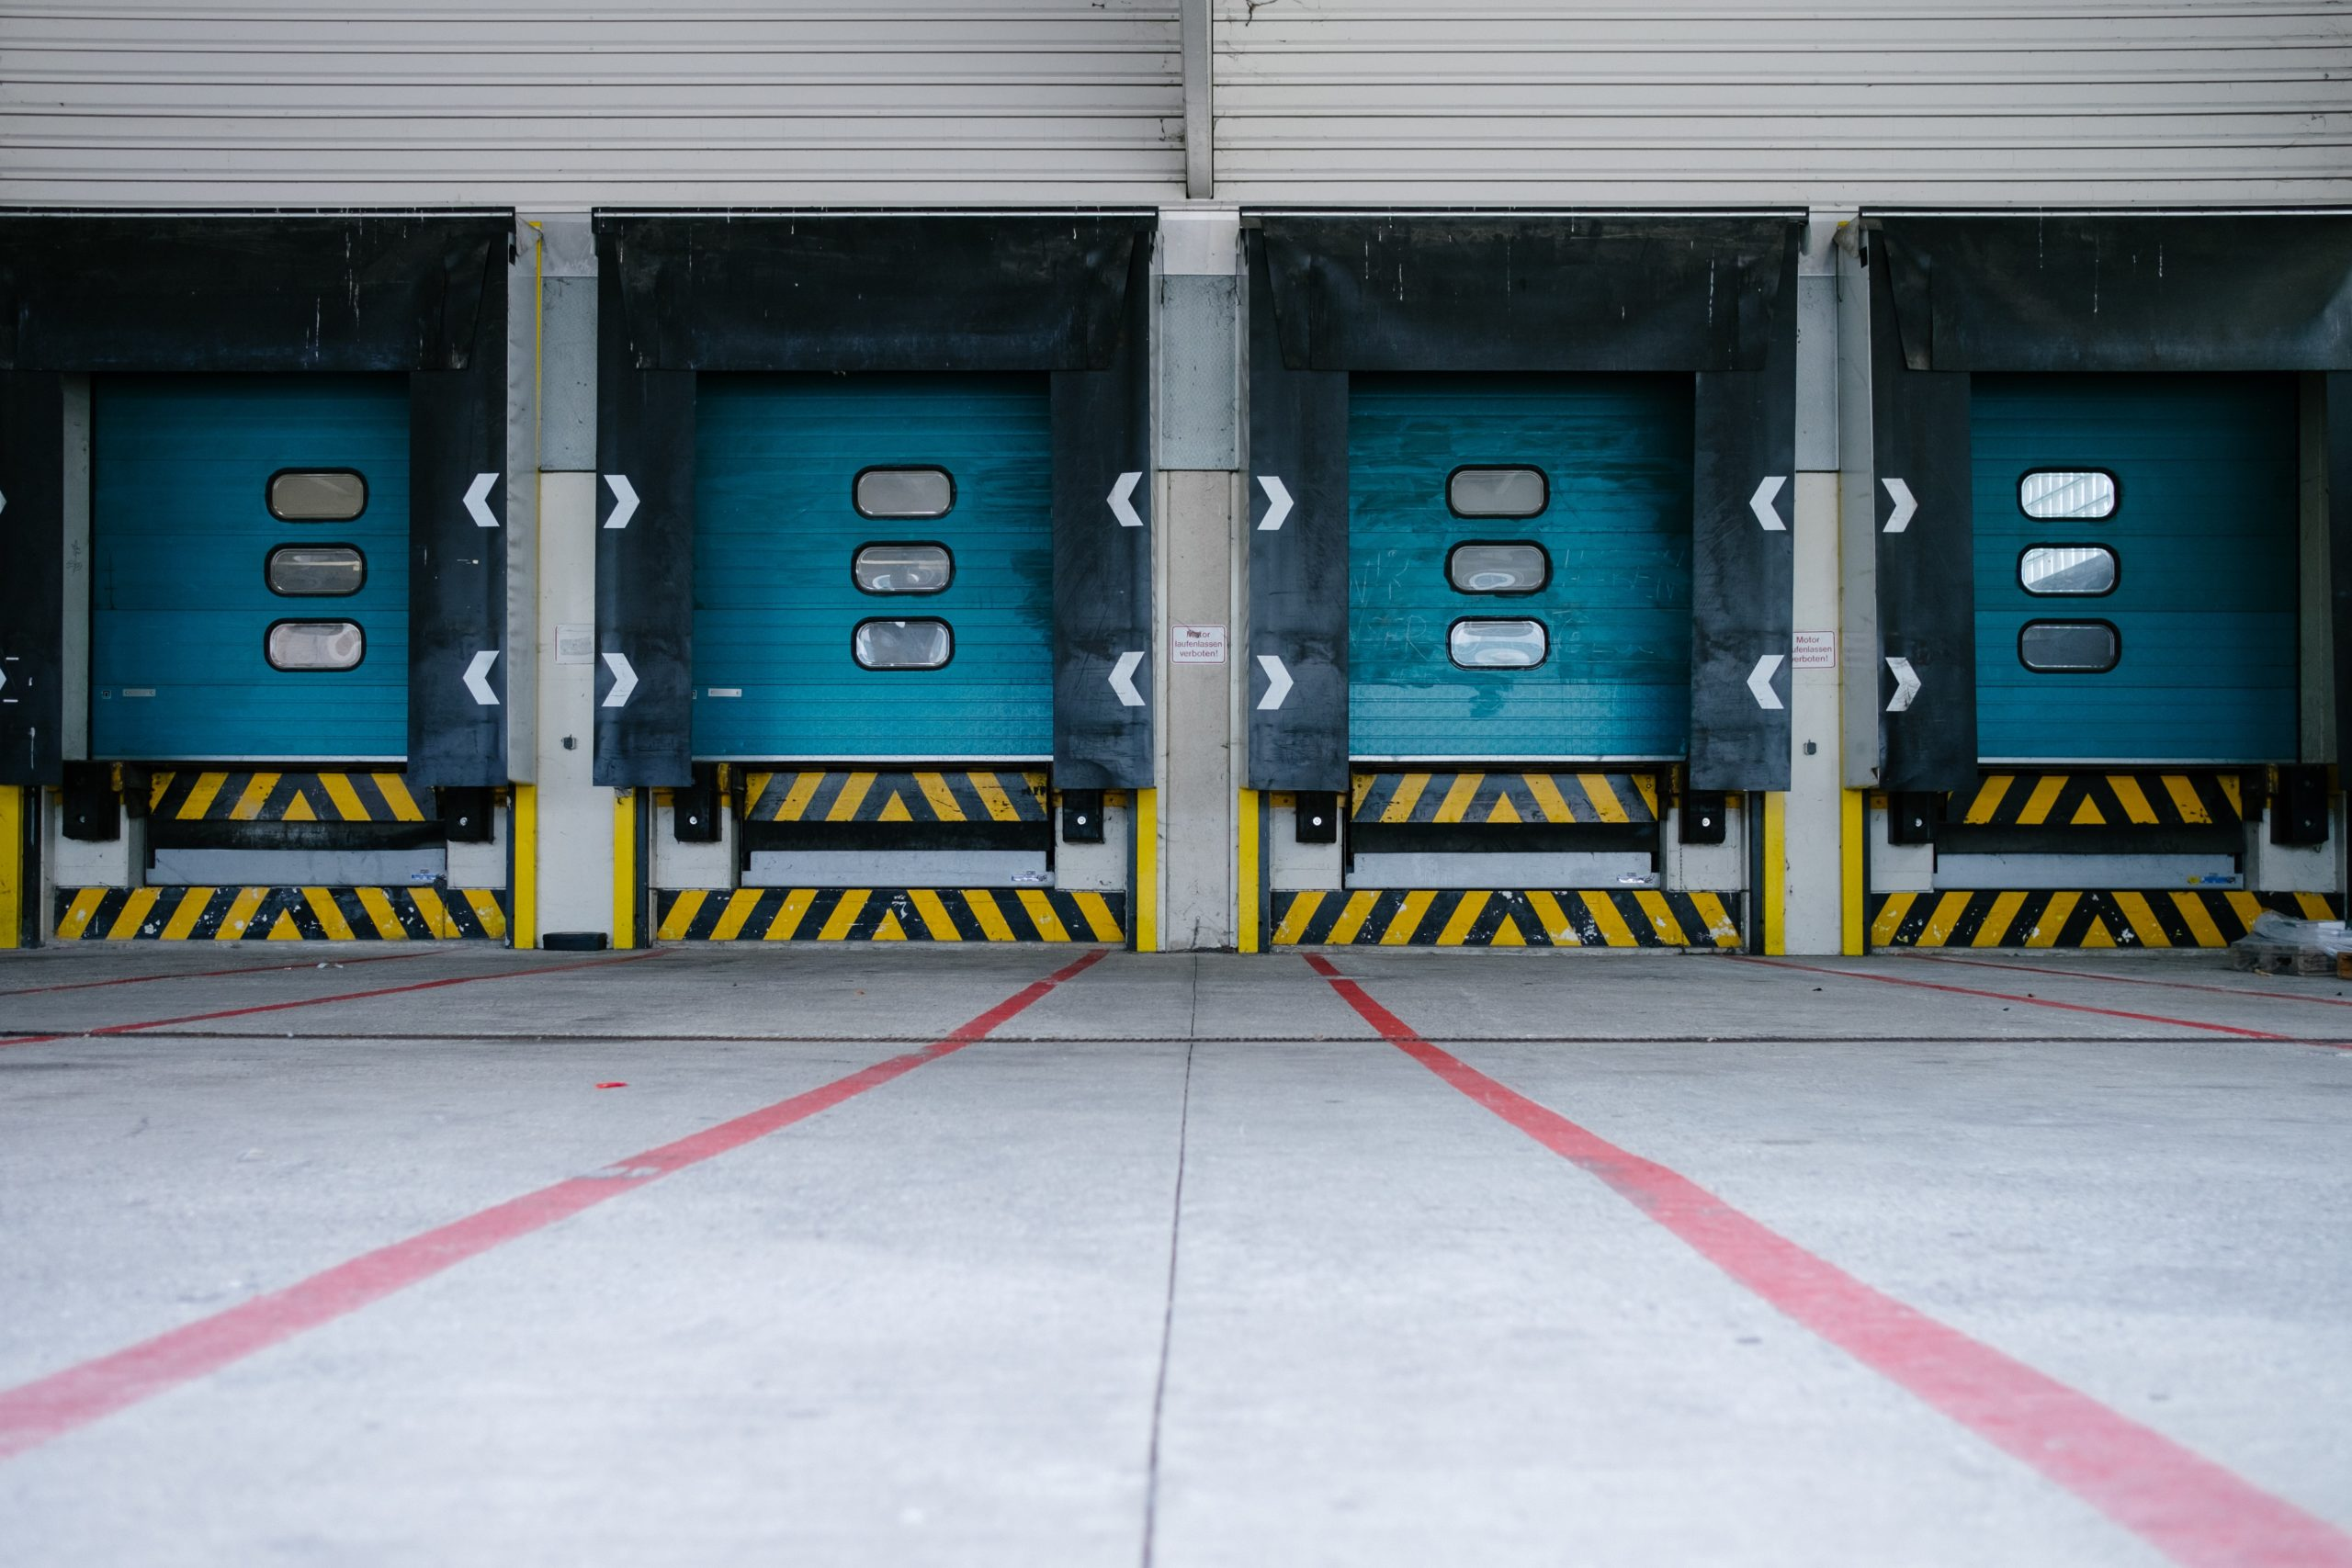 Position IT-Sicherheitsgesetz logistic-natives e.V. Sommer 2020